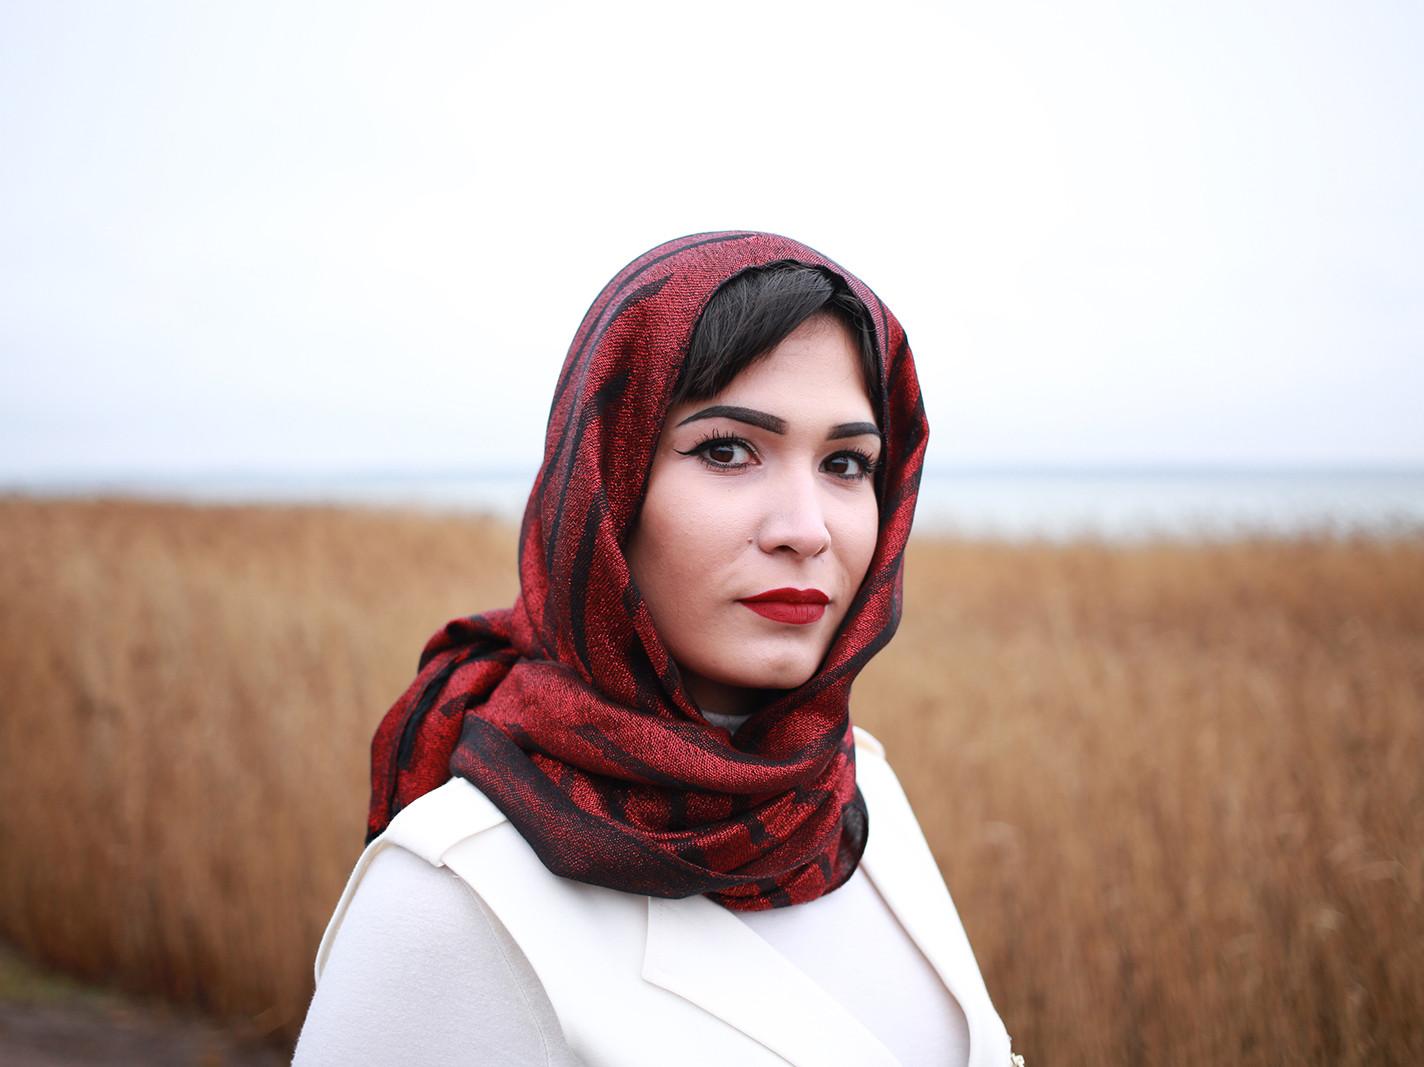 Marwa Eesti moslemikogukonnast. Foto: Annika Haas